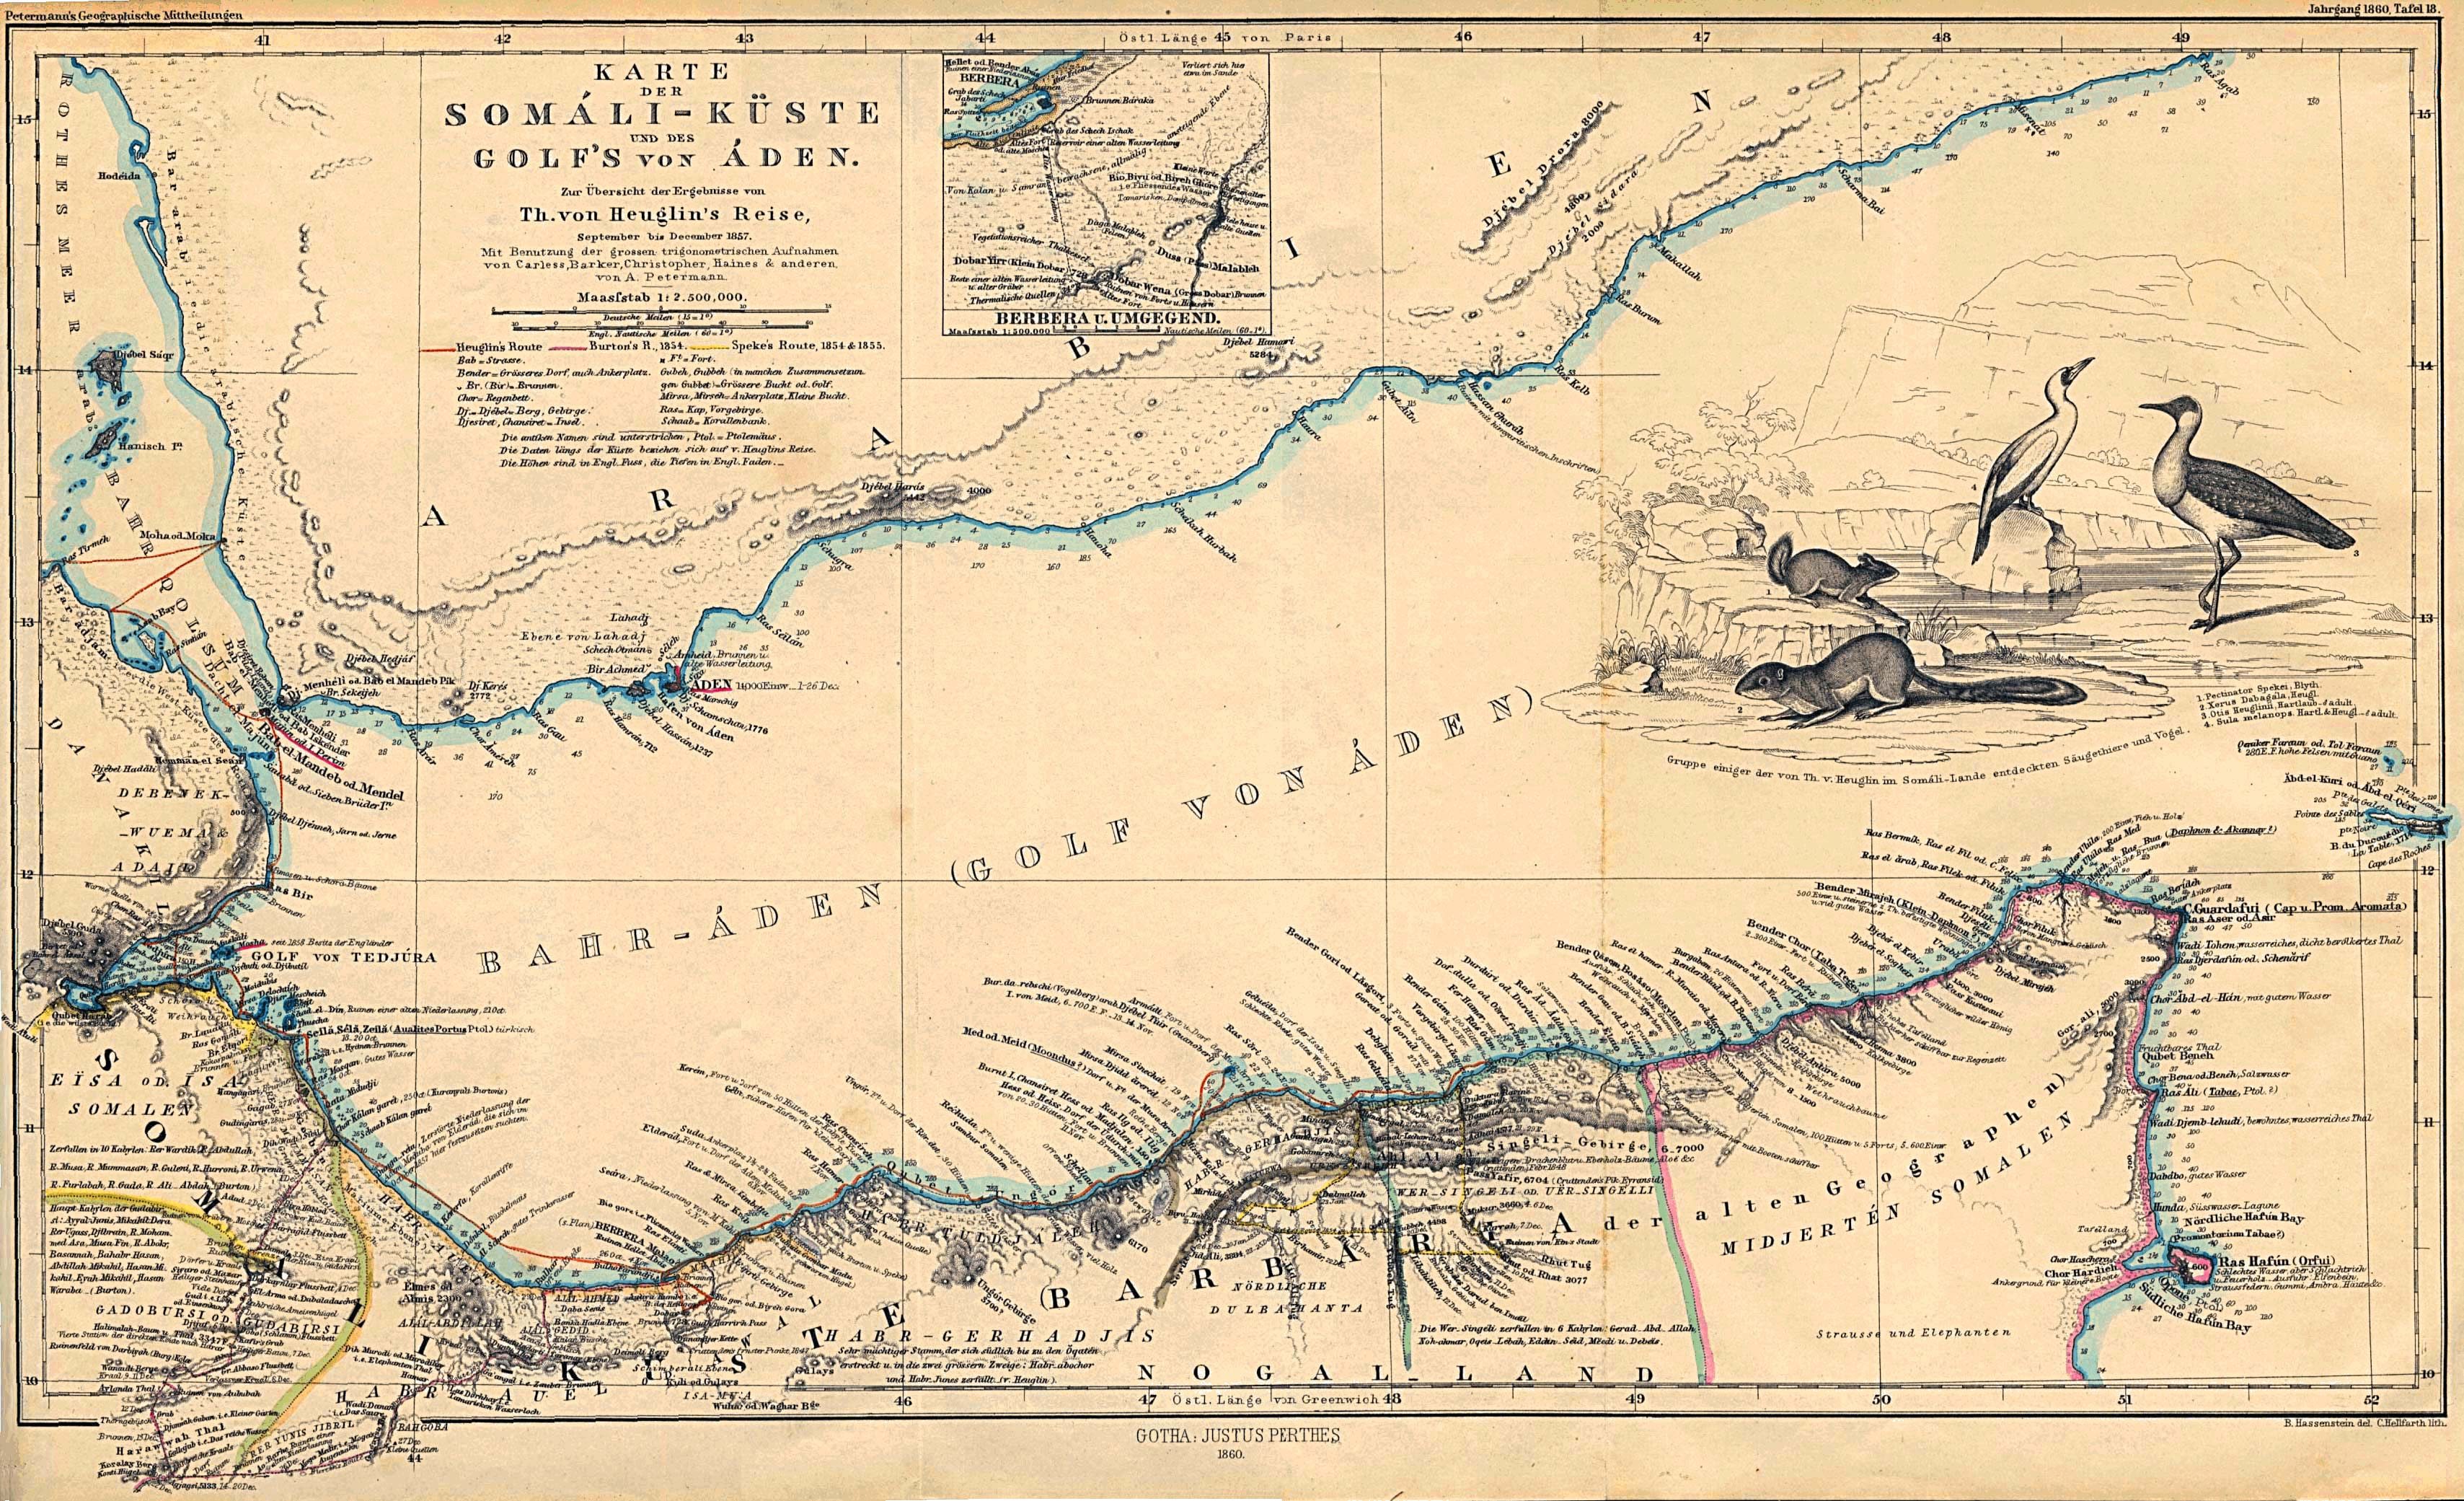 somali coast and aden gulf 1860